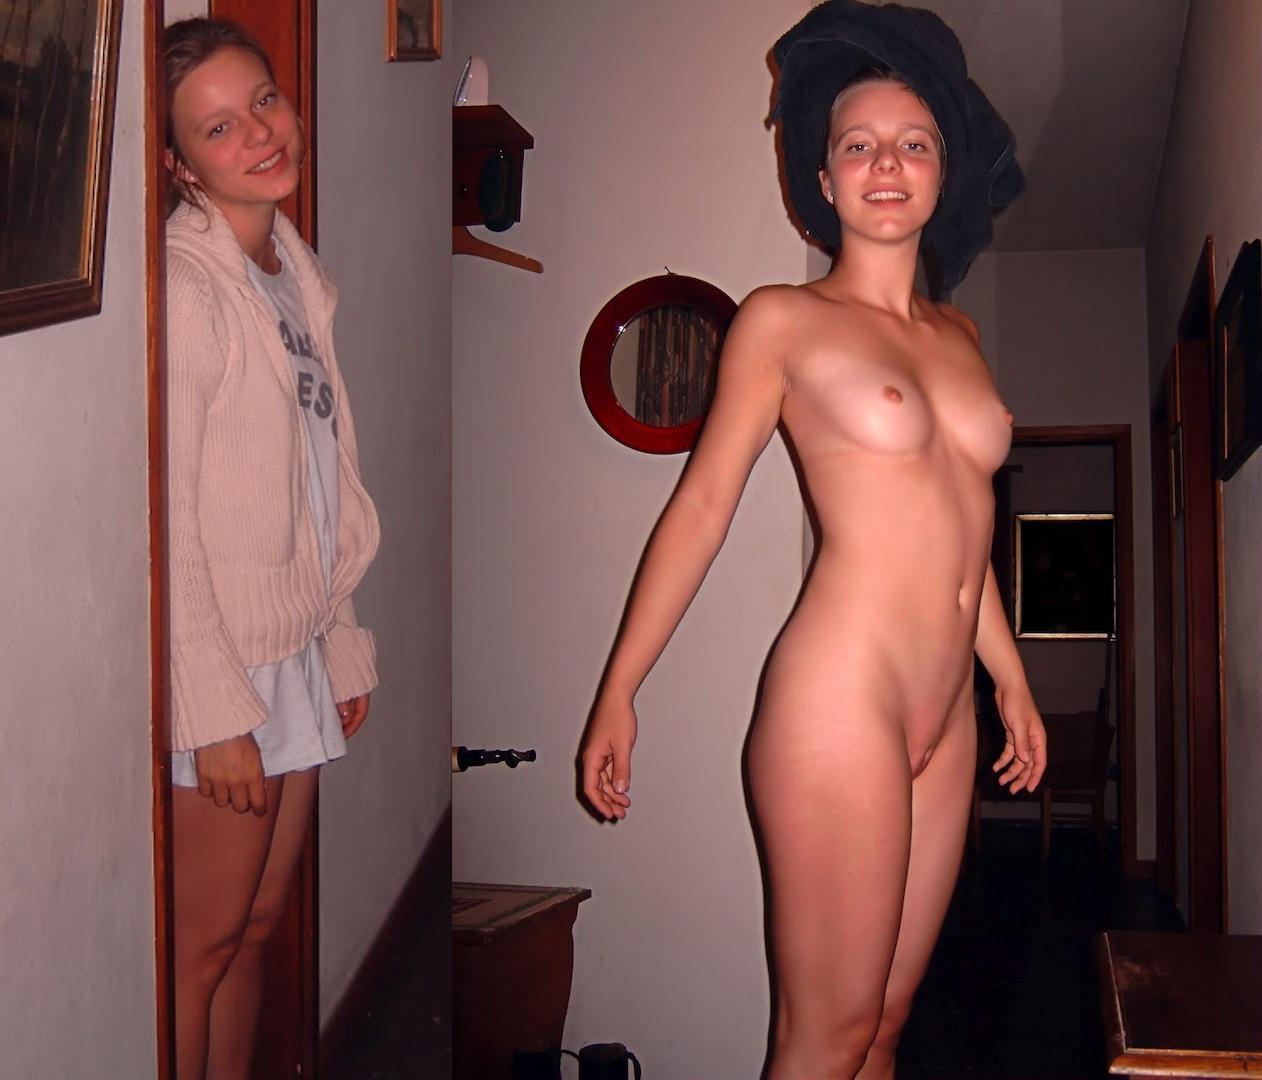 https://sexyna.org/wp-content/uploads/2019/12/Holky-před-a-po-28.jpg